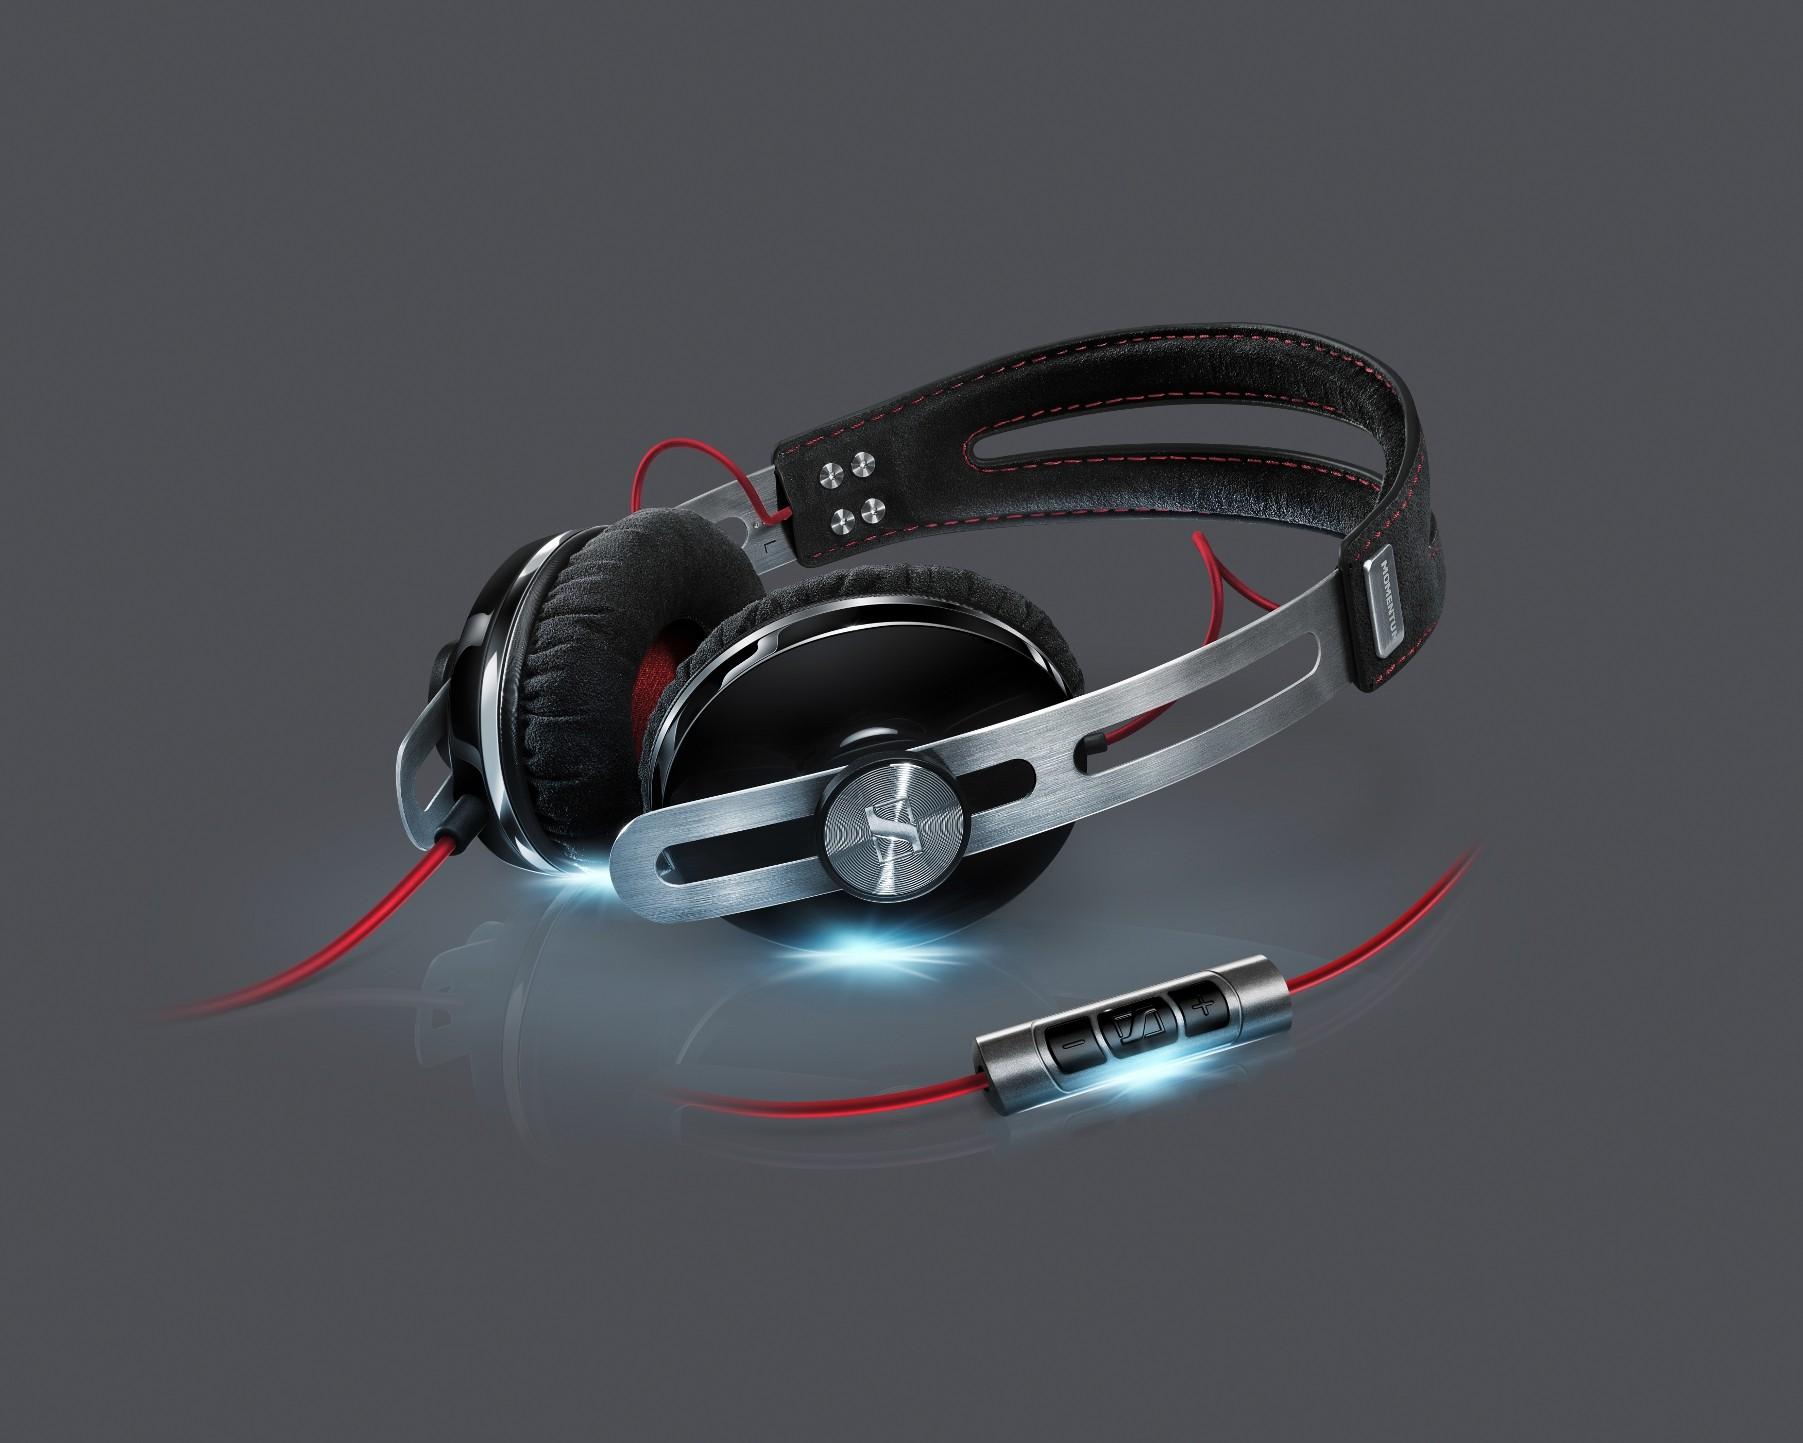 New Black, Brown and Red Sennheiser MOMENTUM On-Ear Headphones | techPowerUp